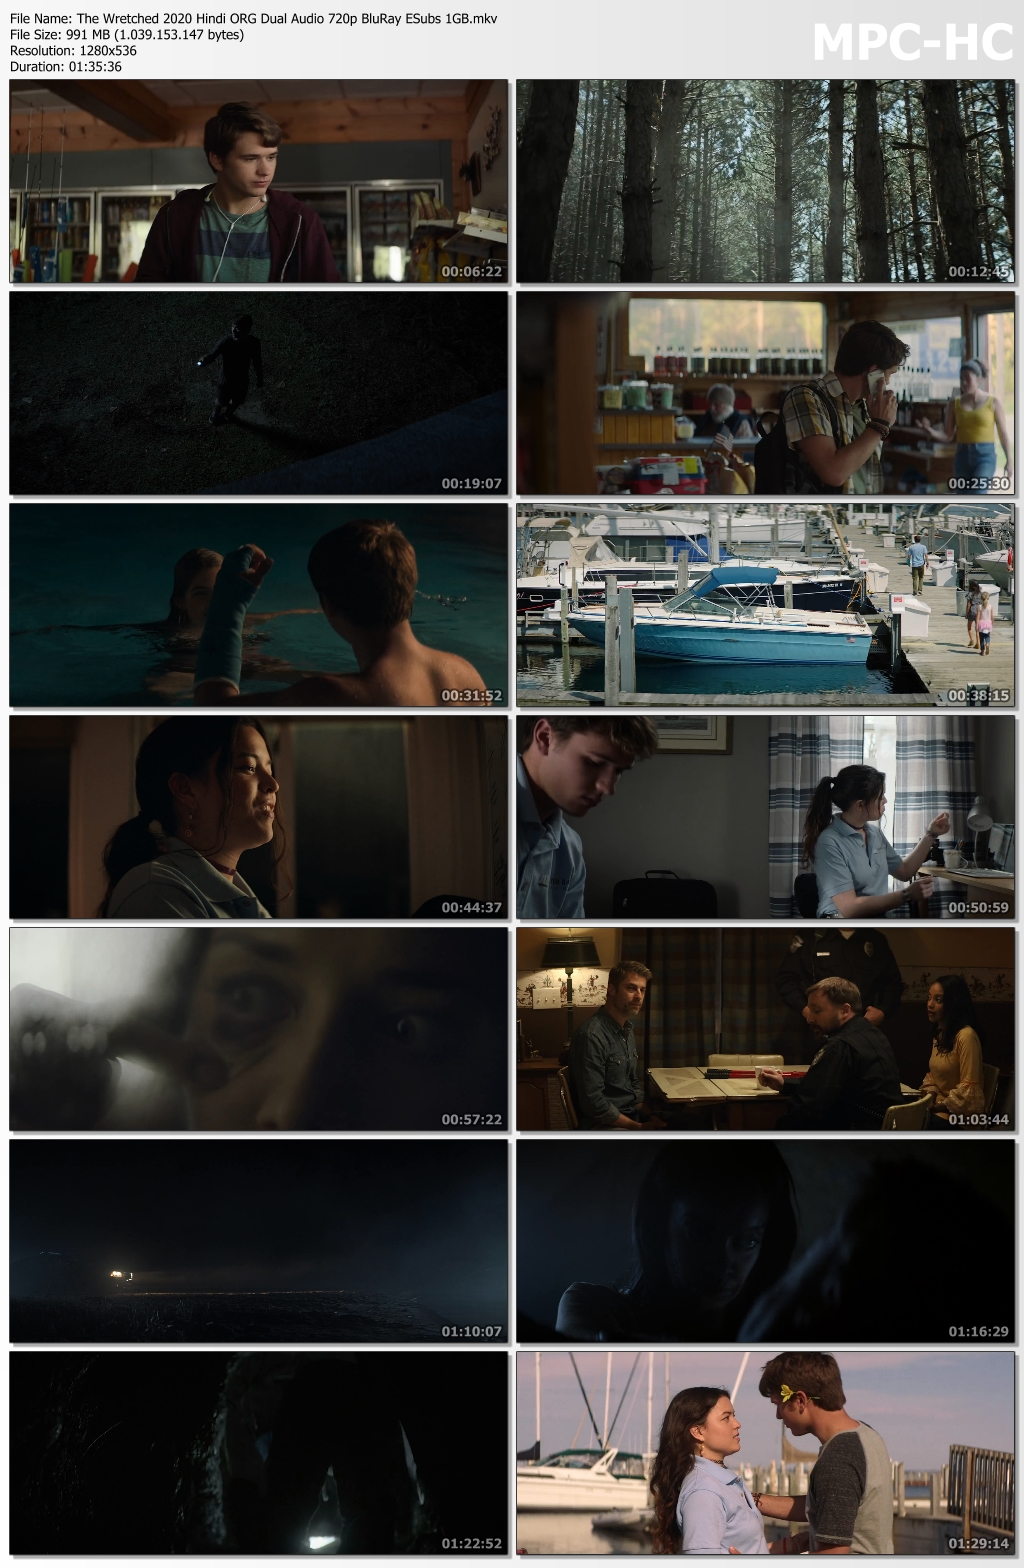 The-Wretched-2020-Hindi-ORG-Dual-Audio-720p-Blu-Ray-ESubs-1-GB-mkv-thumbs